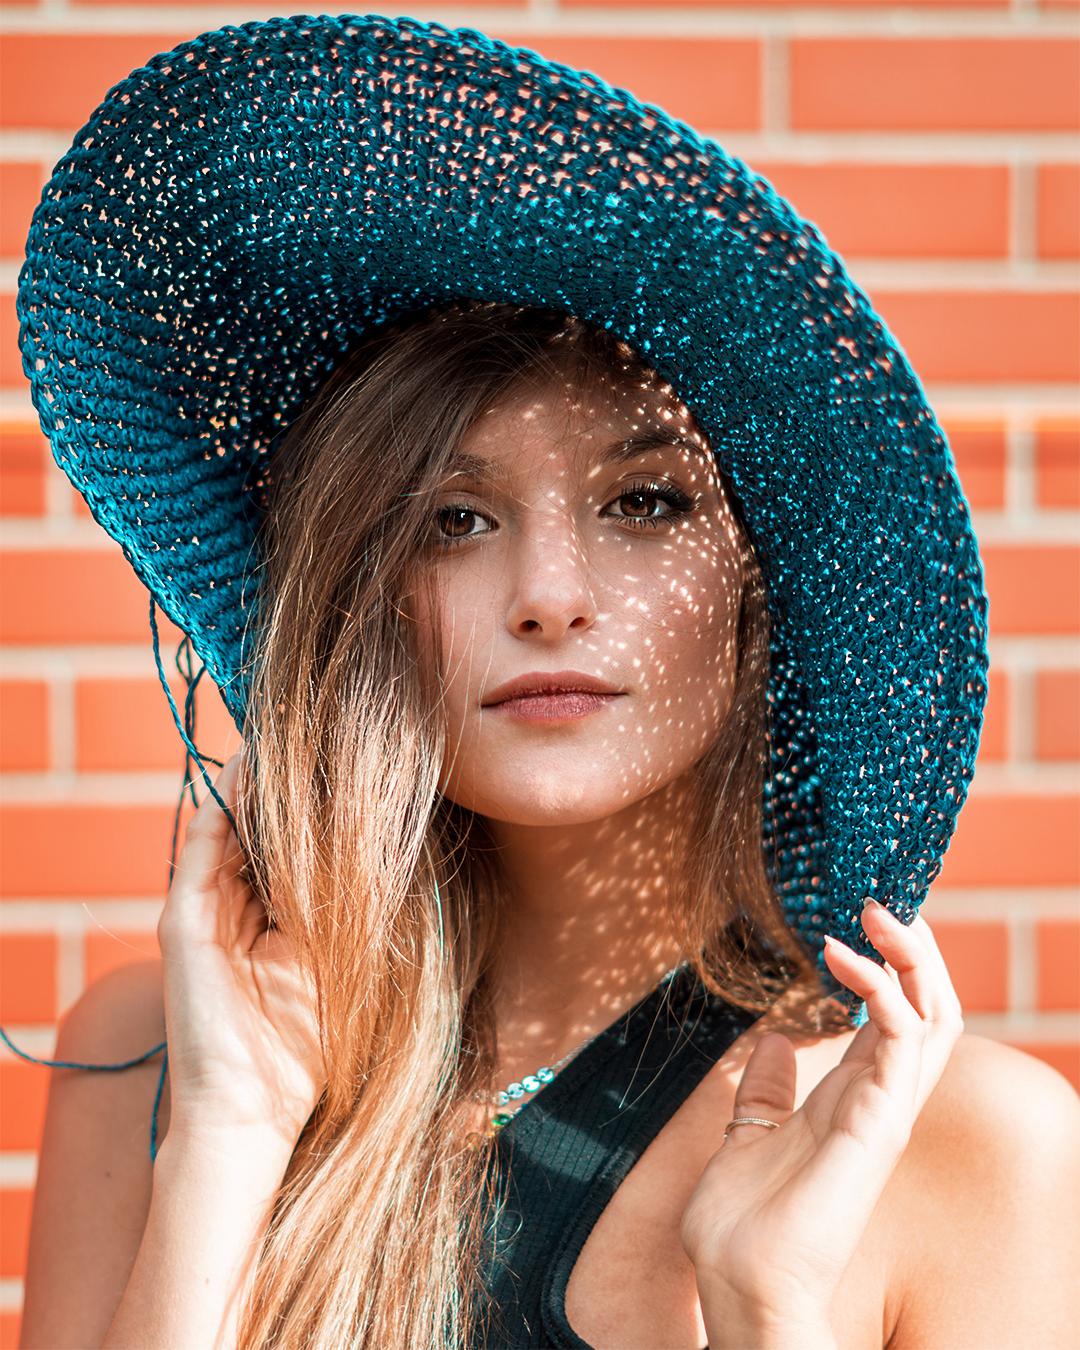 Categorie: Fashion, Glamour, Portrait; Photo: LUCA BARAGIOTTA (lucabaragiotta_ph); Location: Monza, MB